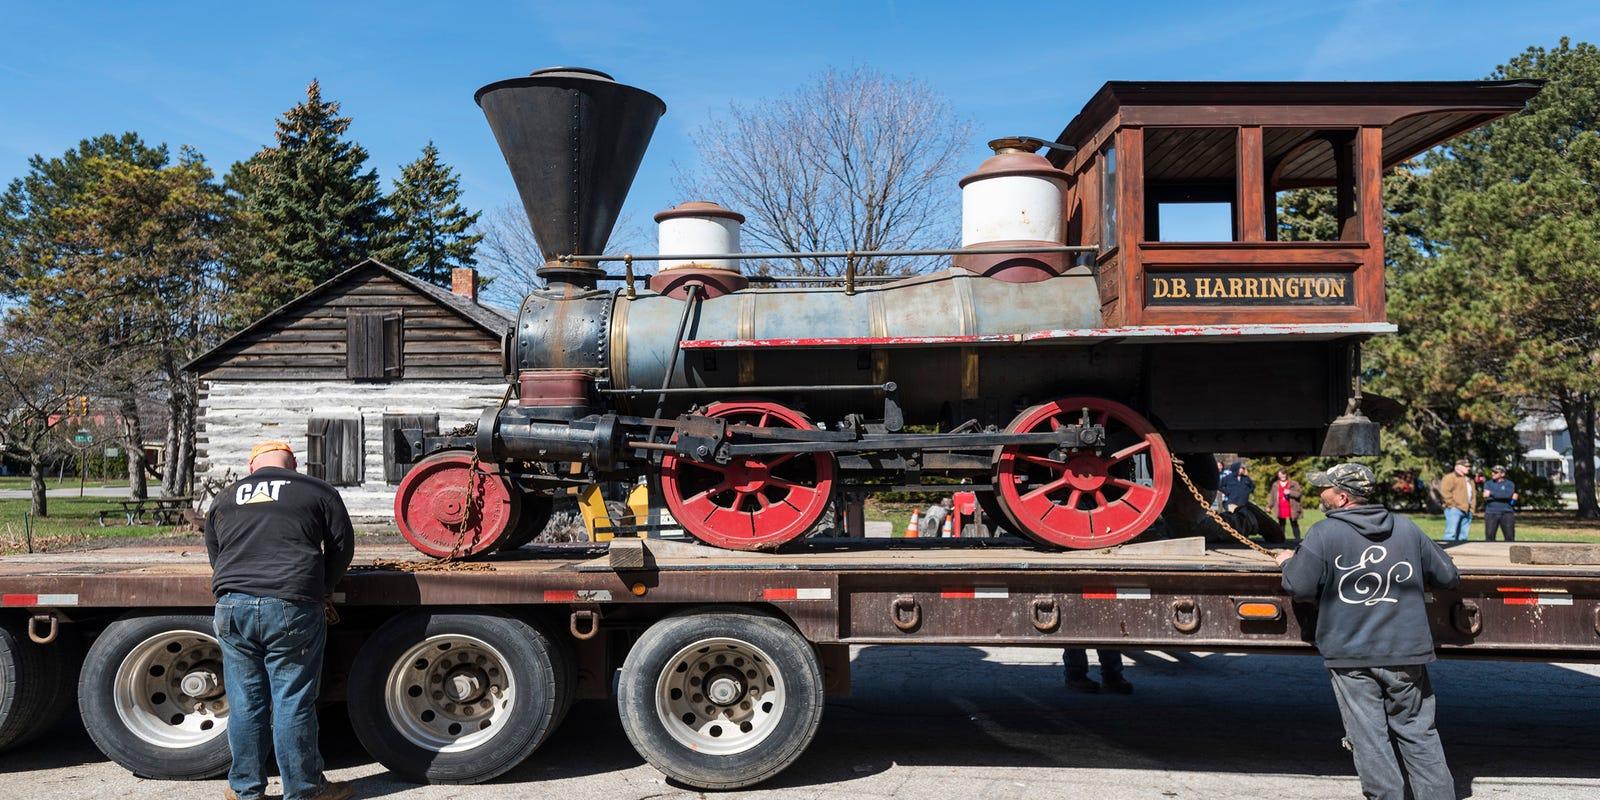 Port Huron Museum will put 140-year-old steam locomotive